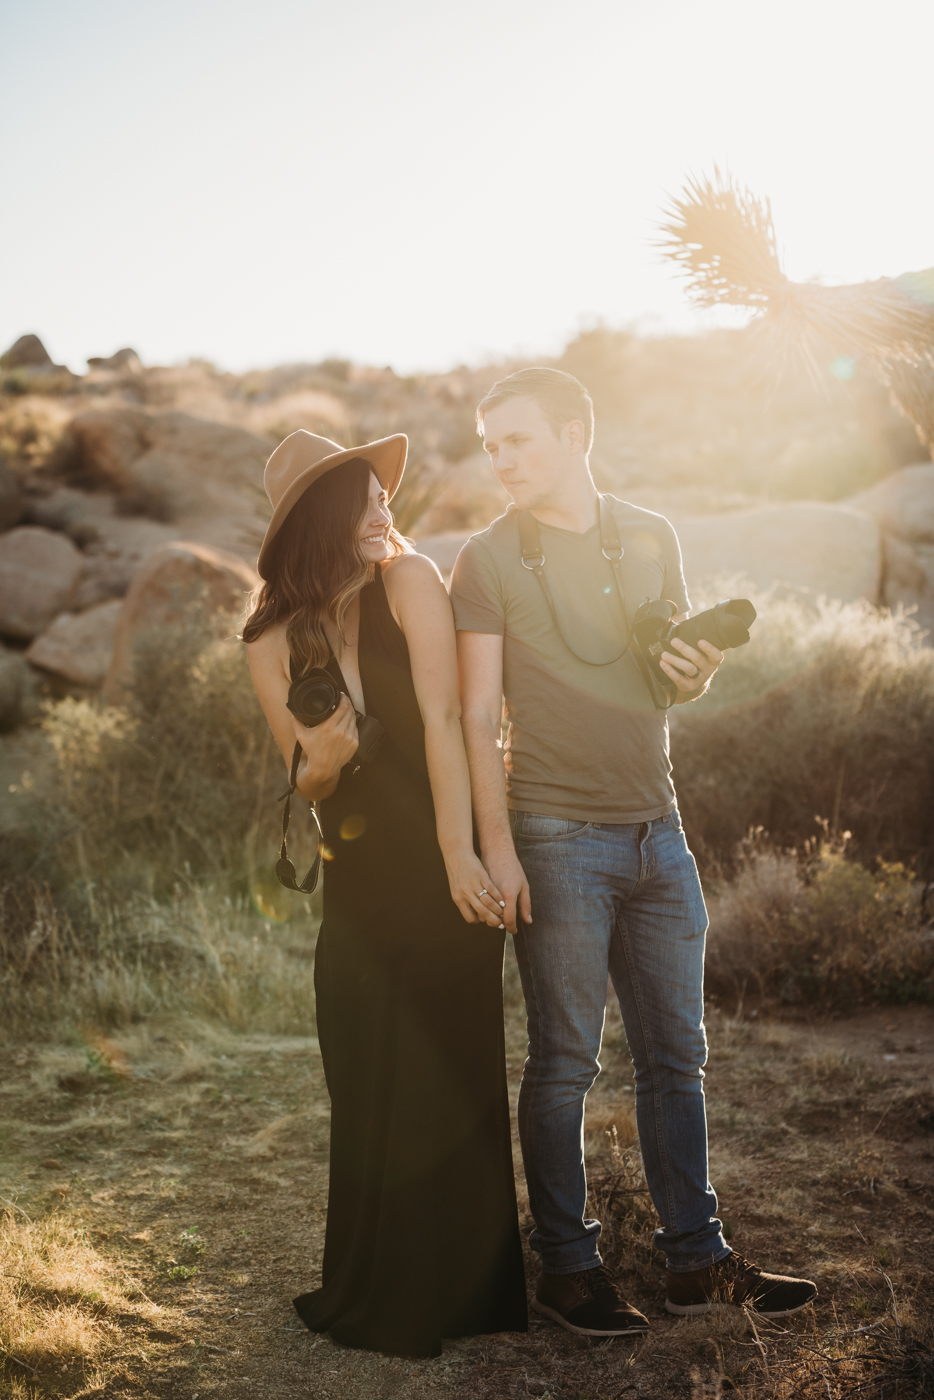 FortSt.John_photographer_TyraEPhotography_Wedding_Couple_Family_Photograhy_DawsonCreek_Elopement_Bride_Boduoir_Portraits-4278.jpg